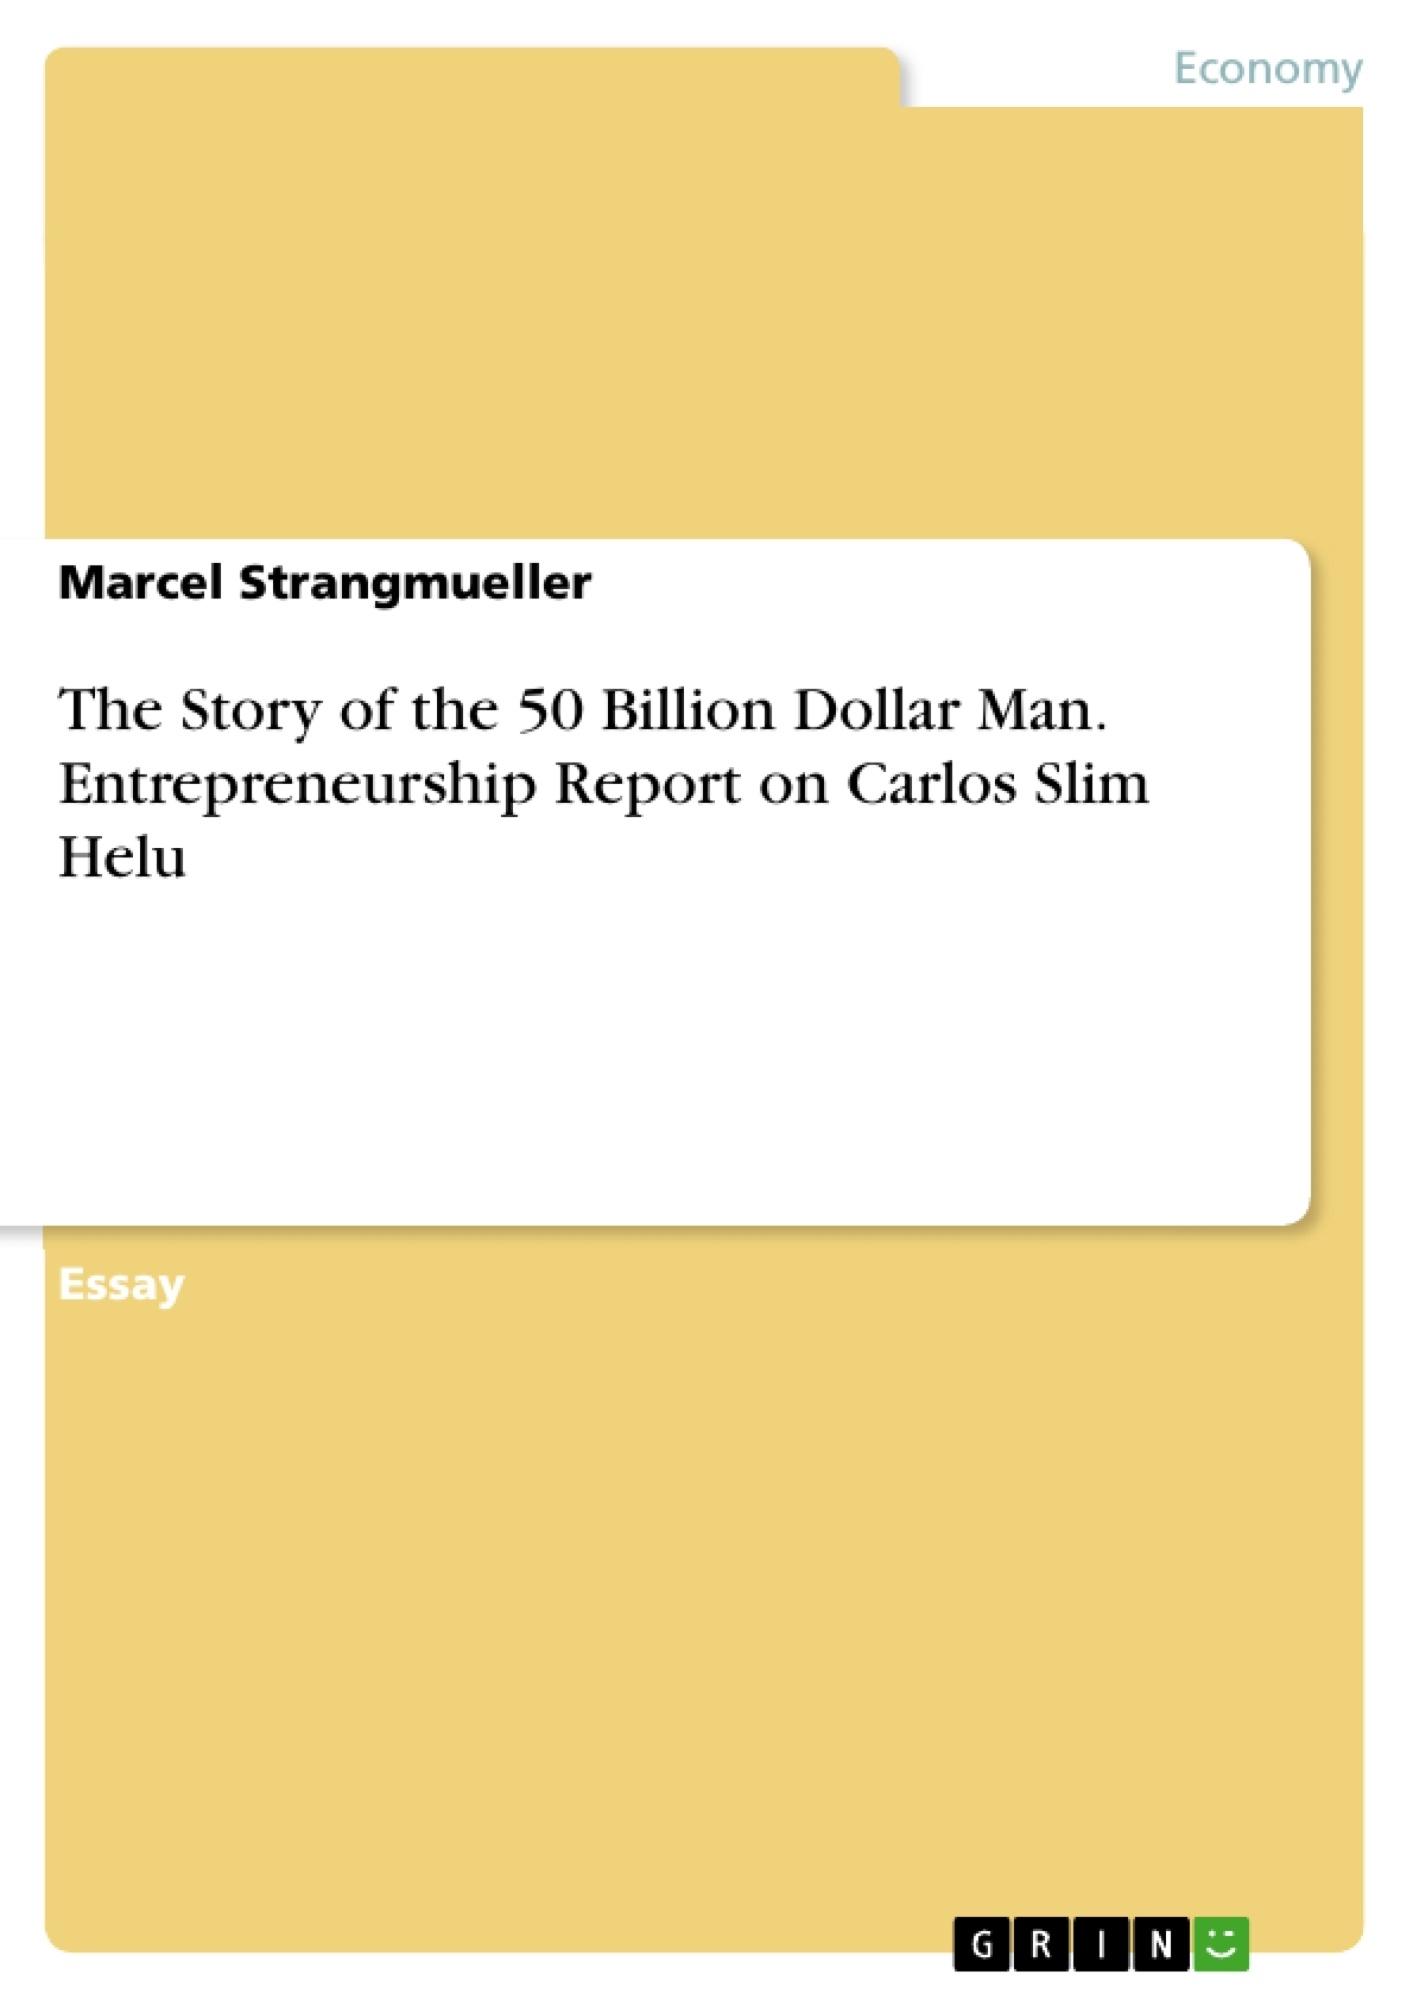 Title: The Story of the 50 Billion Dollar Man. Entrepreneurship Report on Carlos Slim Helu